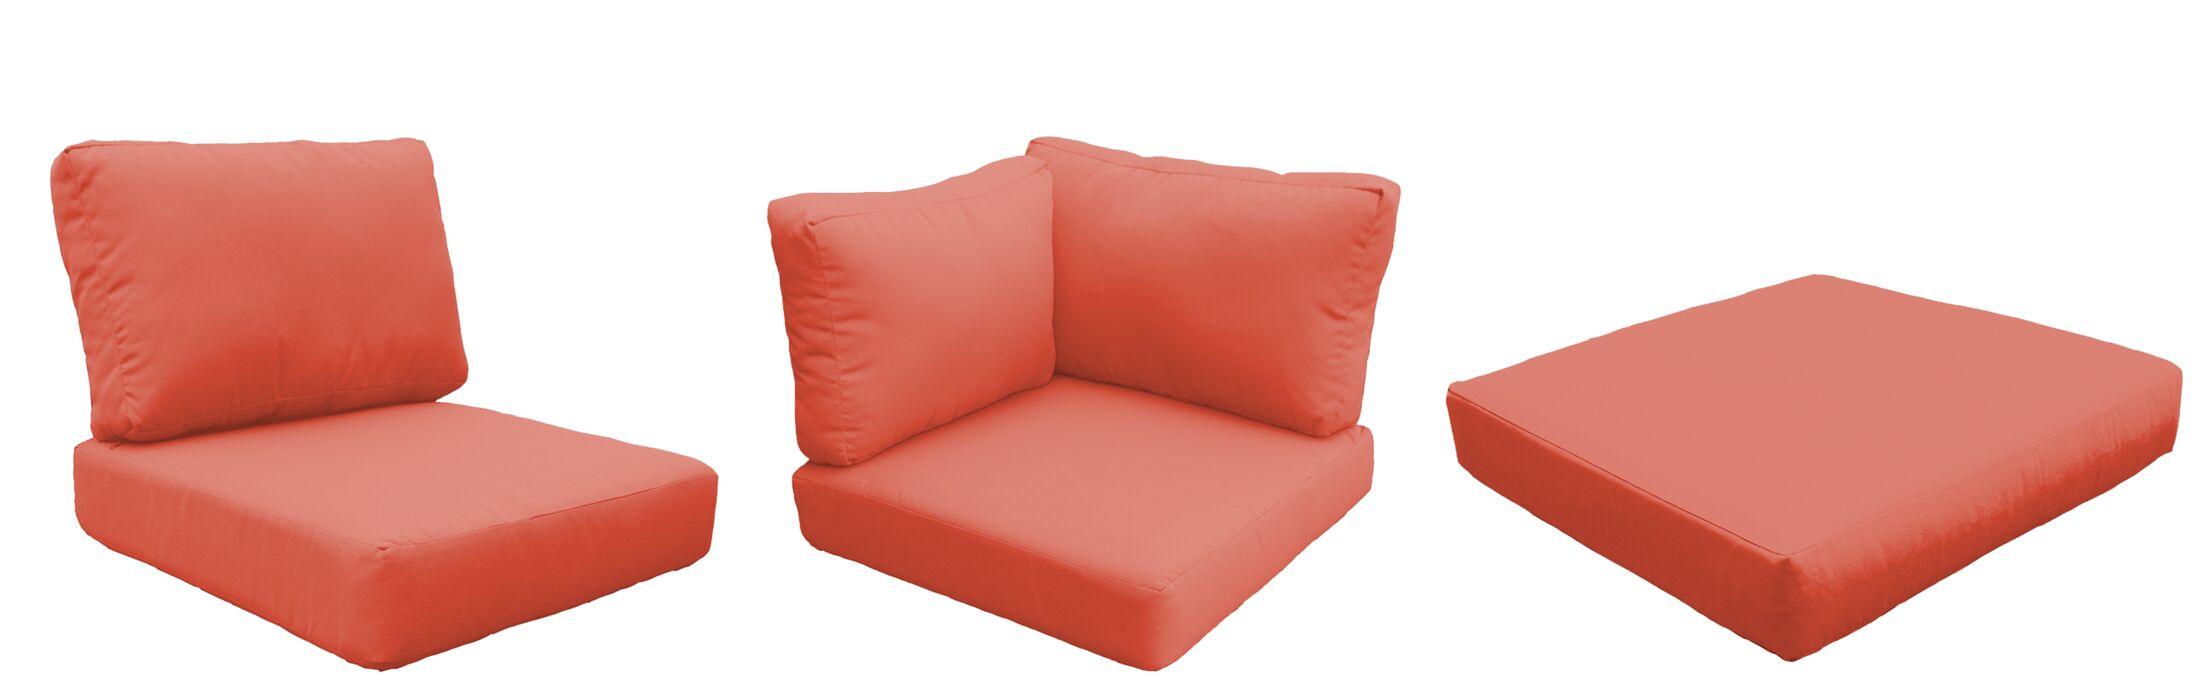 Eldredge 14 Piece Outdoor Cushion Set Fabric: Tangerine